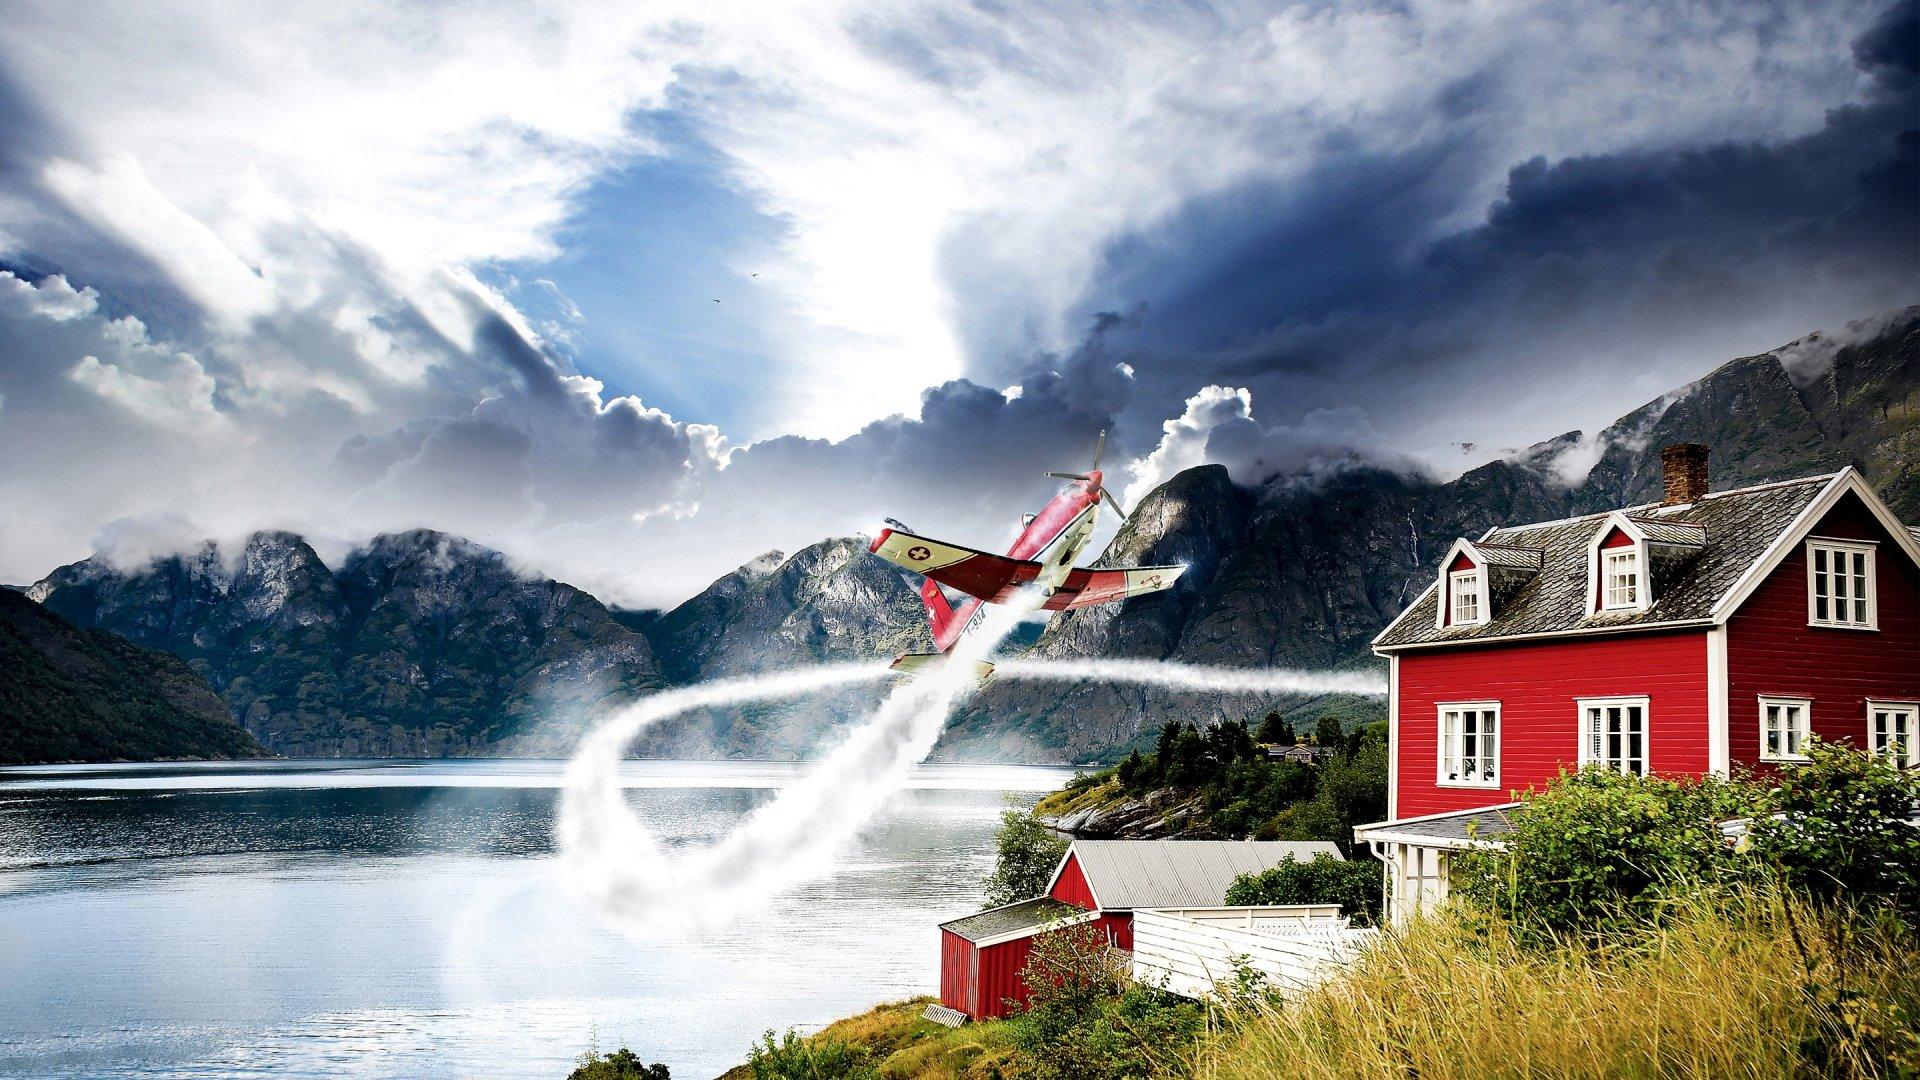 Wallpaper Aviación noruega Images